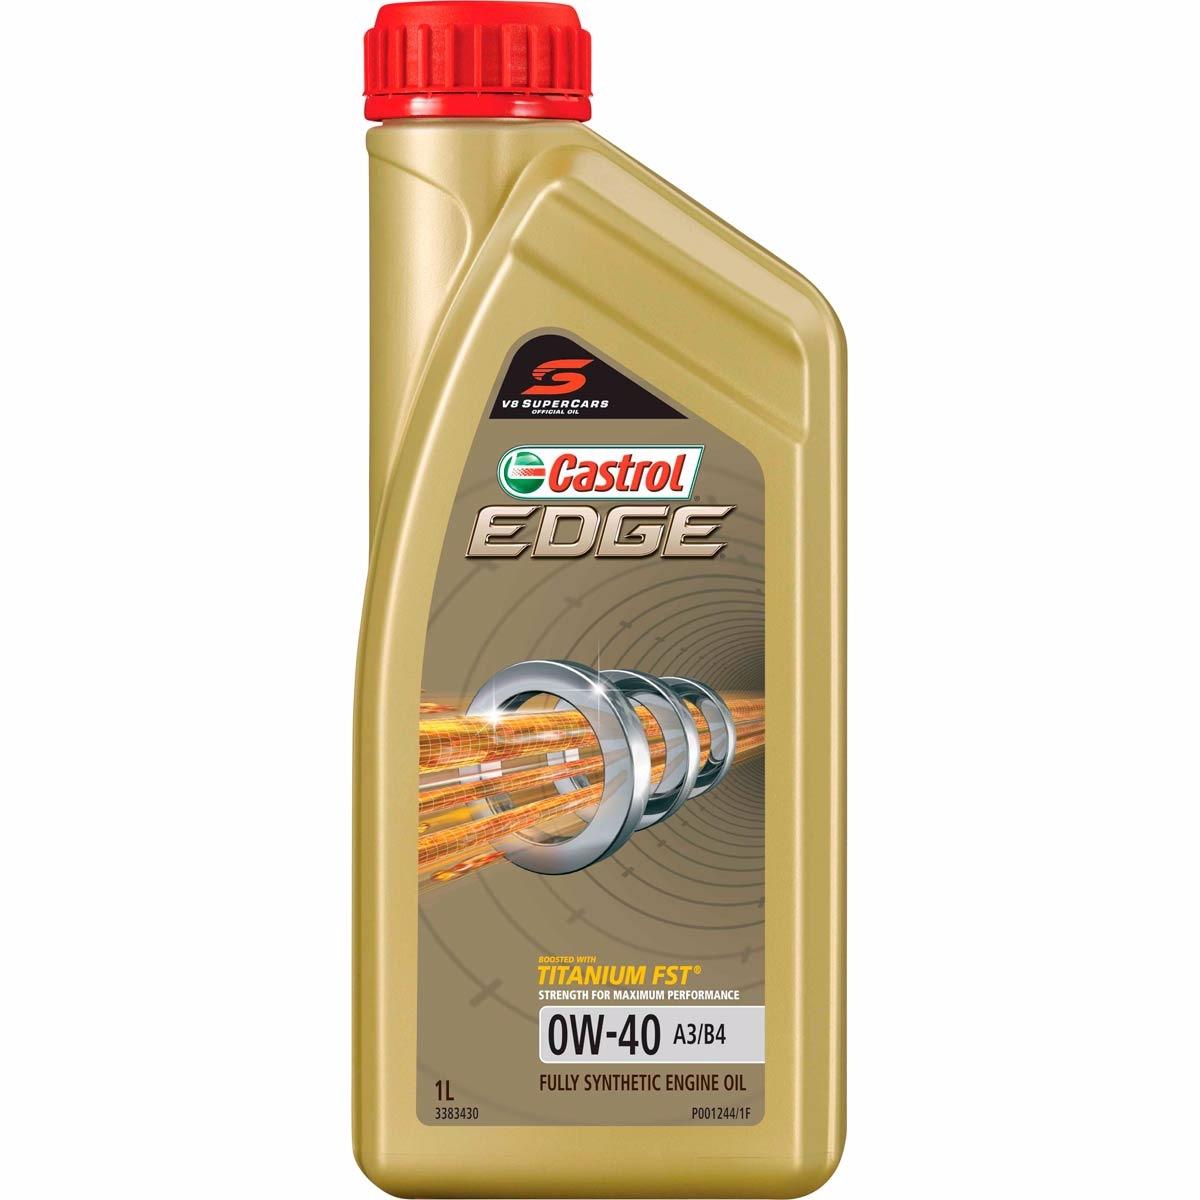 Edge 0W40 1 liter